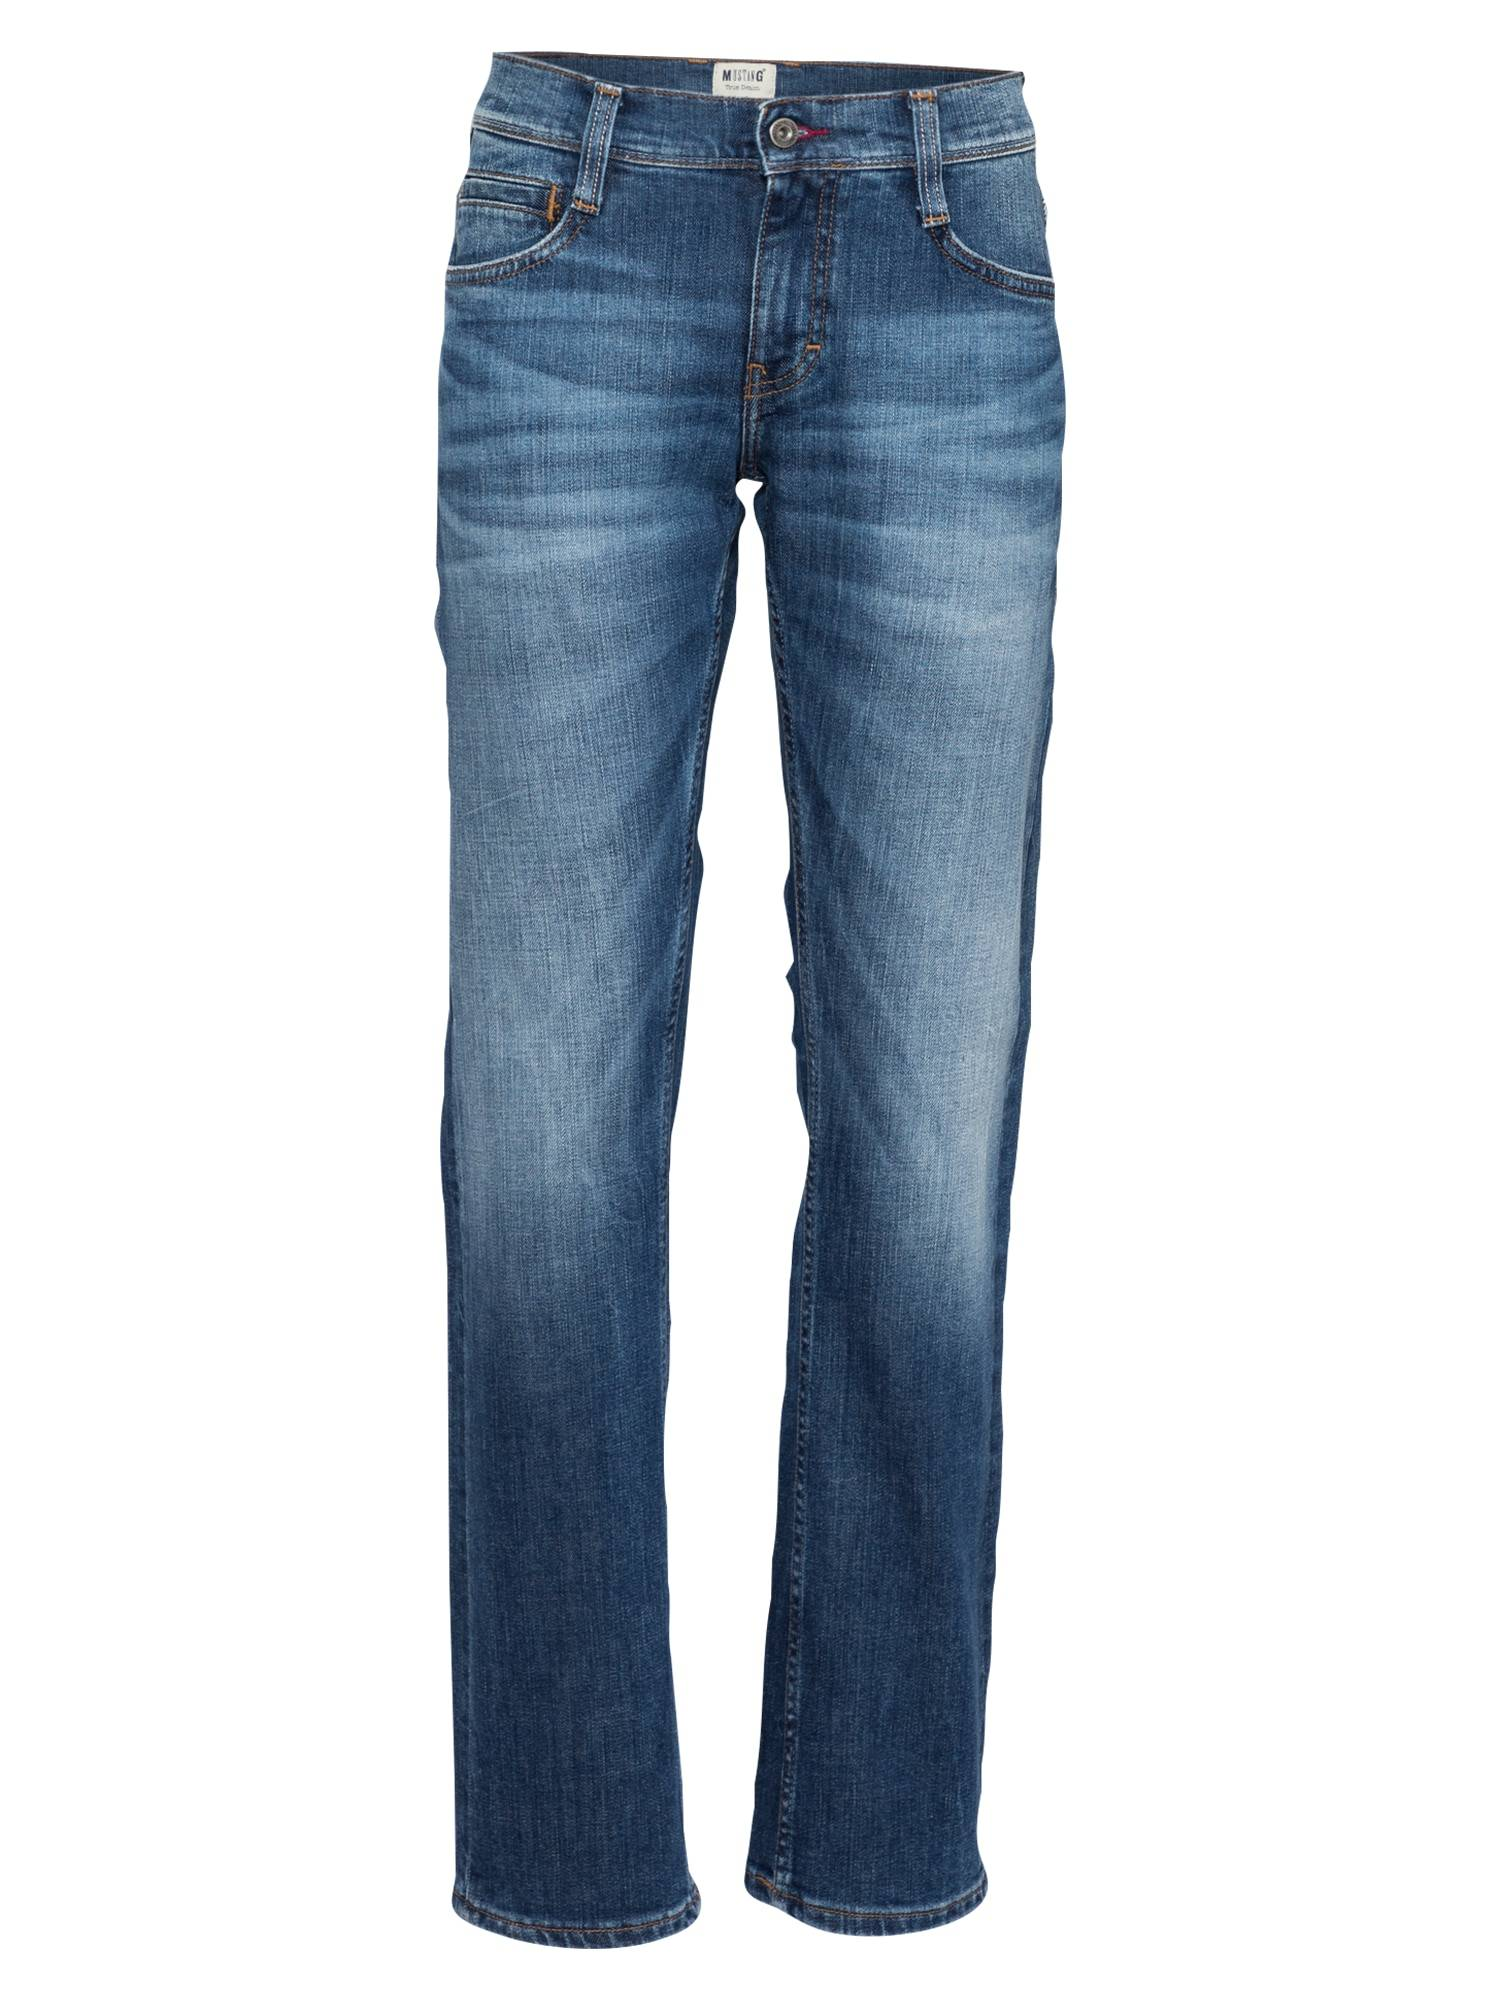 MUSTANG Jean 'Oregon '  - Bleu - Taille: 31 - male